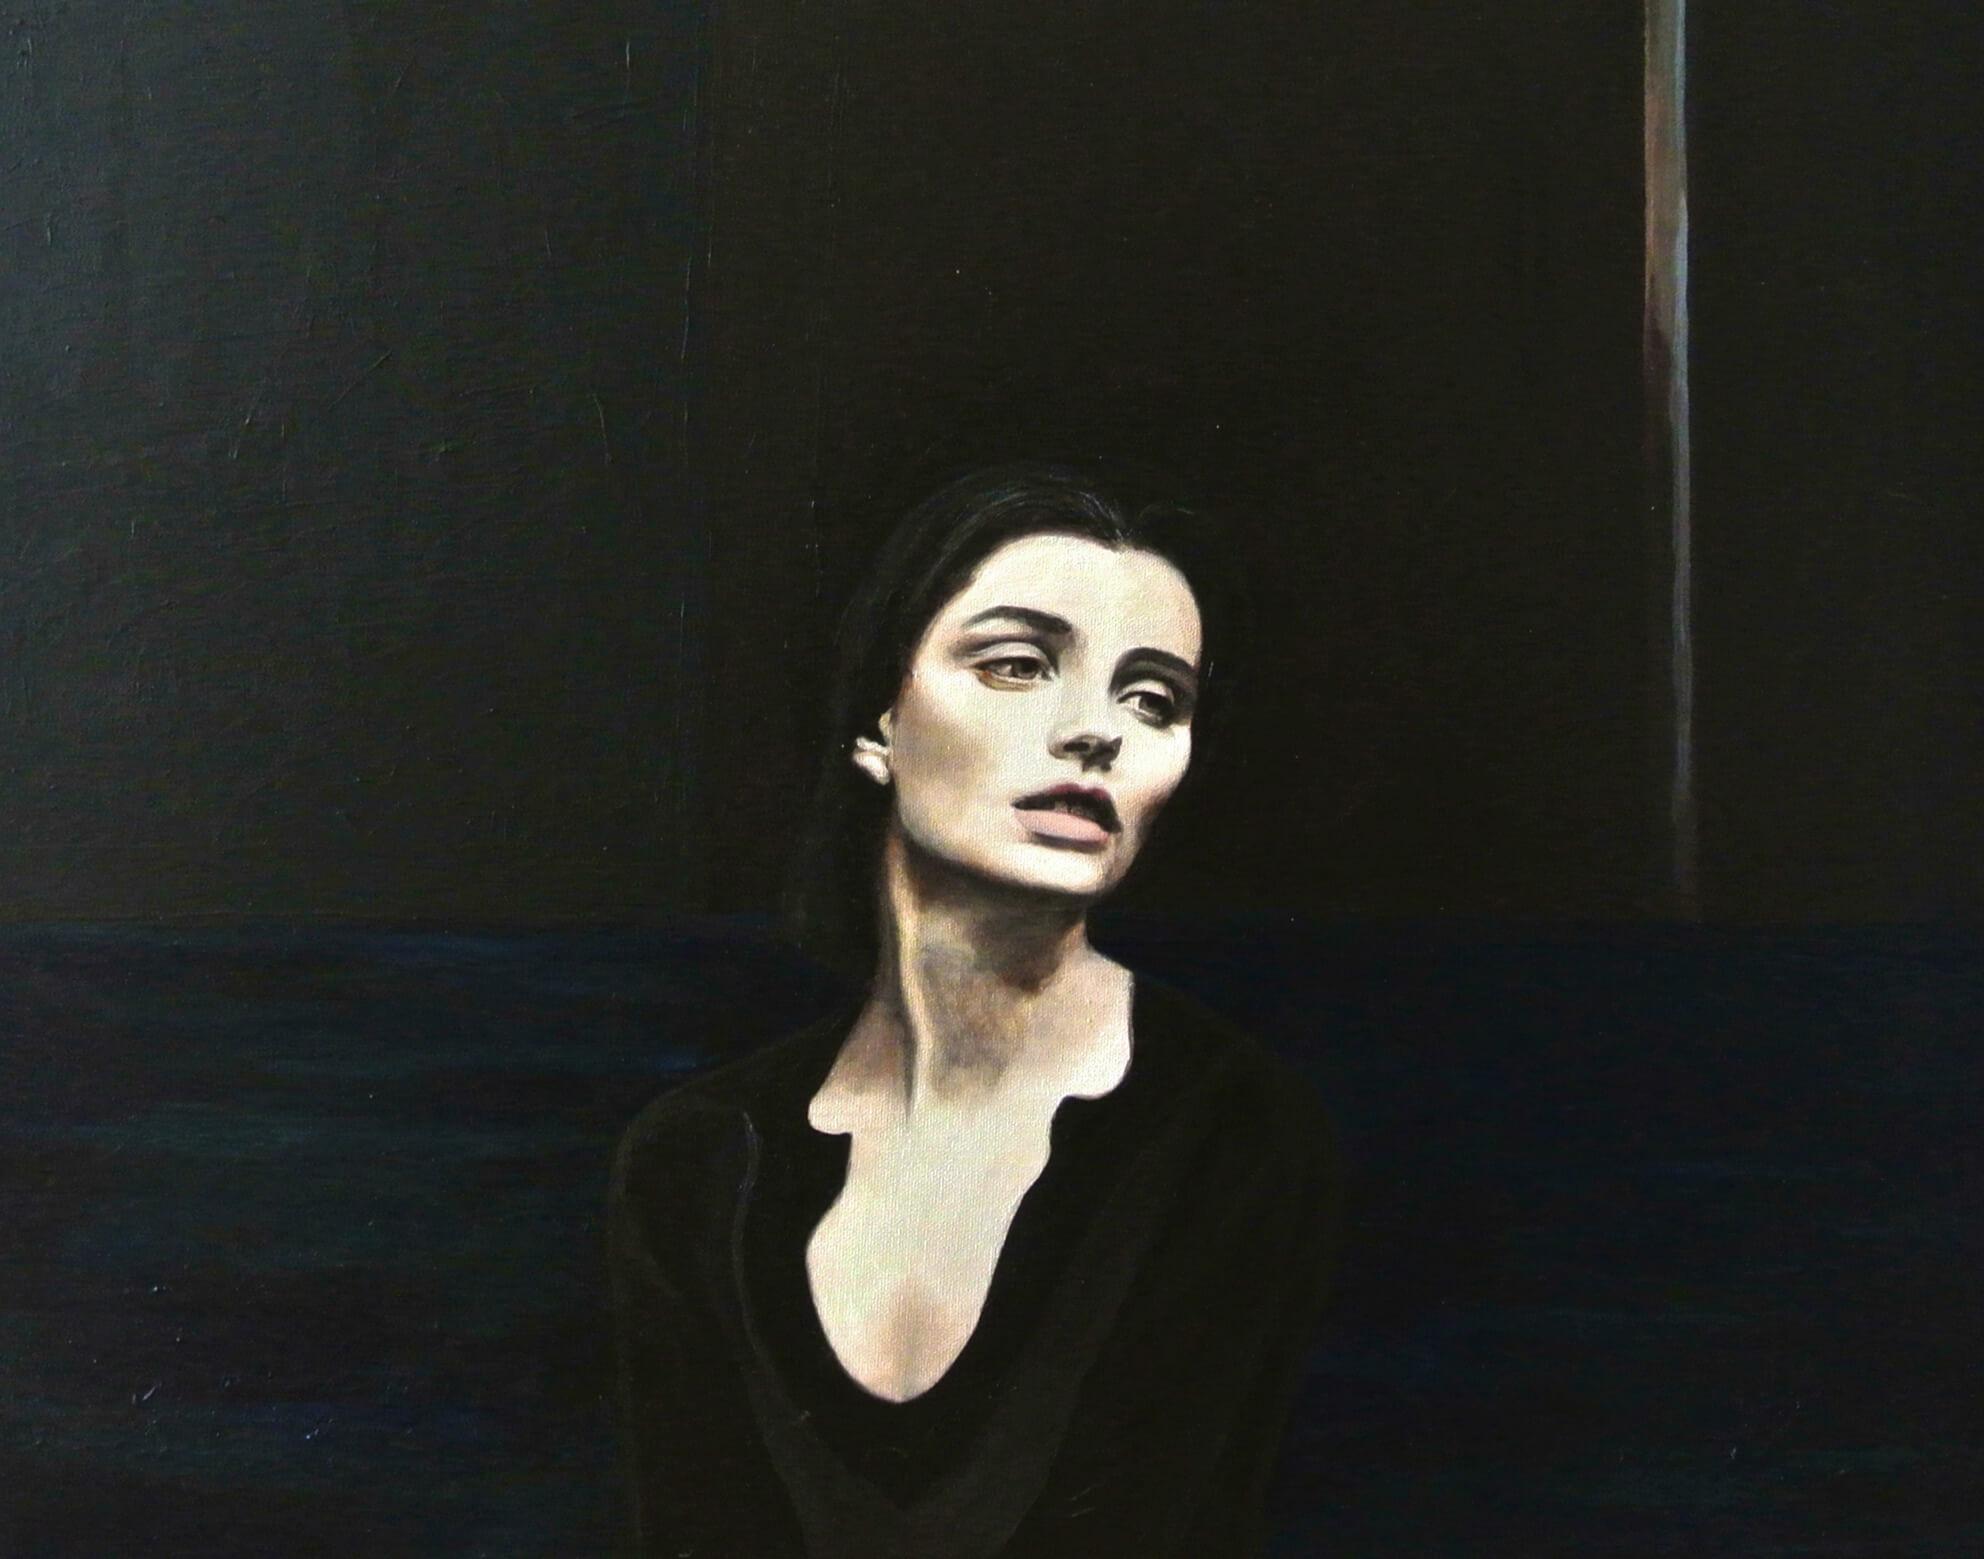 Blue Hour I, 60x70x4 cm, Malerei, © Ute Latzke, Preis: 1200 Euro.